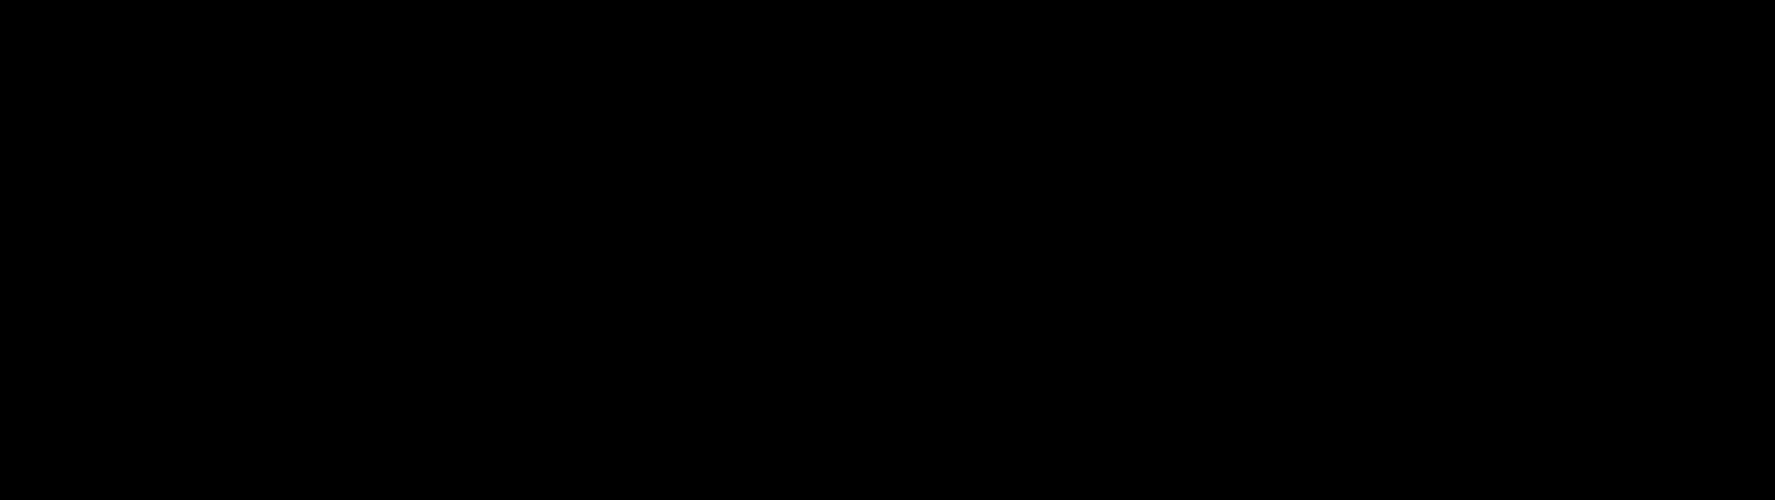 2011-logo-black.png